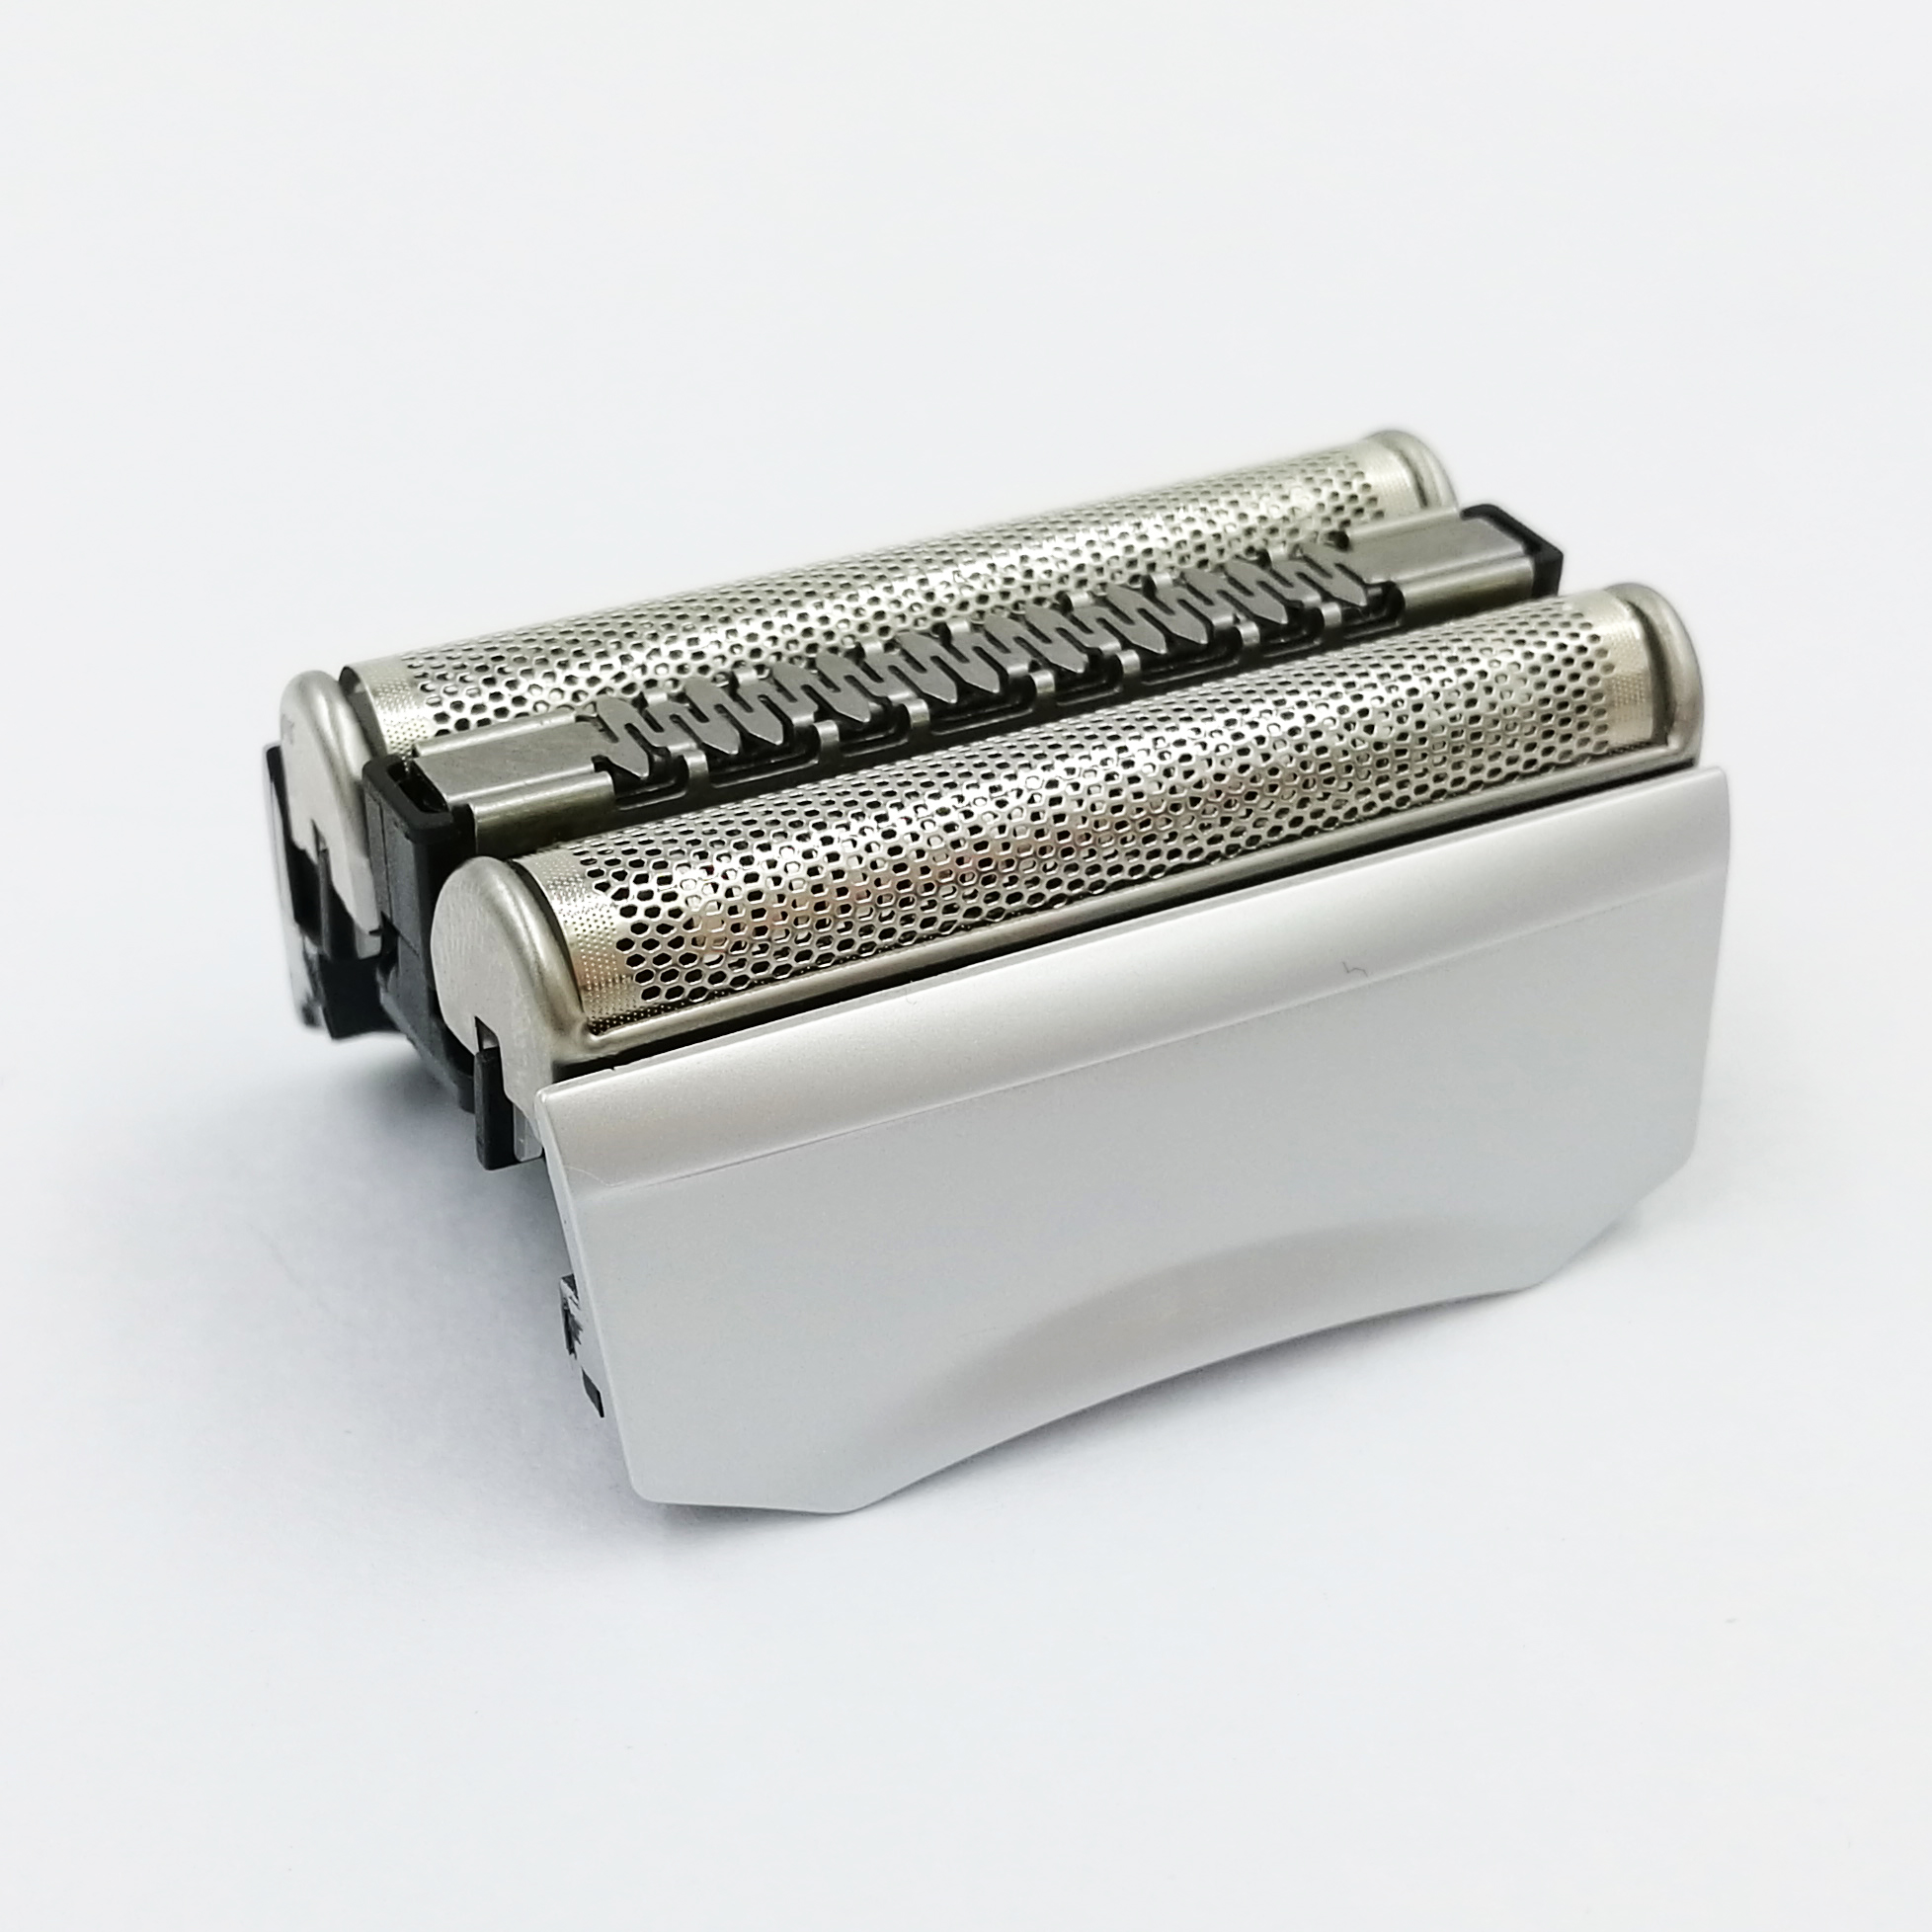 Silver Razor 70S Foil & Cutter Shaver Head For Braun Series 7 720 7865cc 790cc 7893s 797cc 9595 7855 750 7840 Cassette Mesh Grid